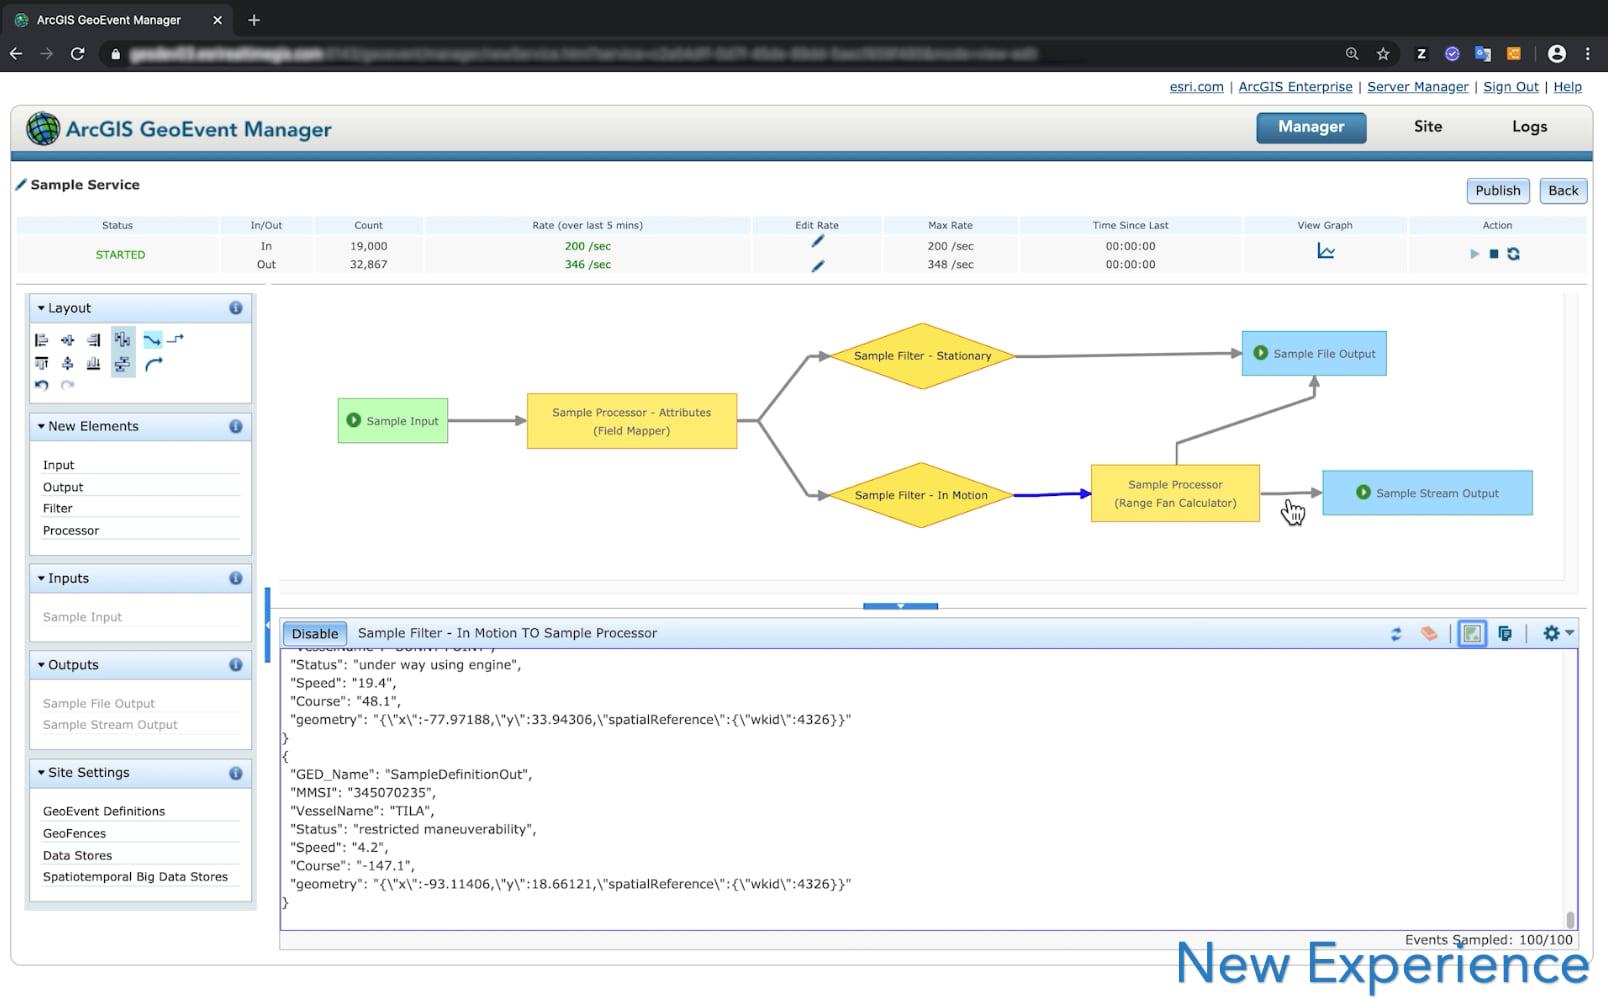 ArcGIS GeoEvent Server Manager dashboard